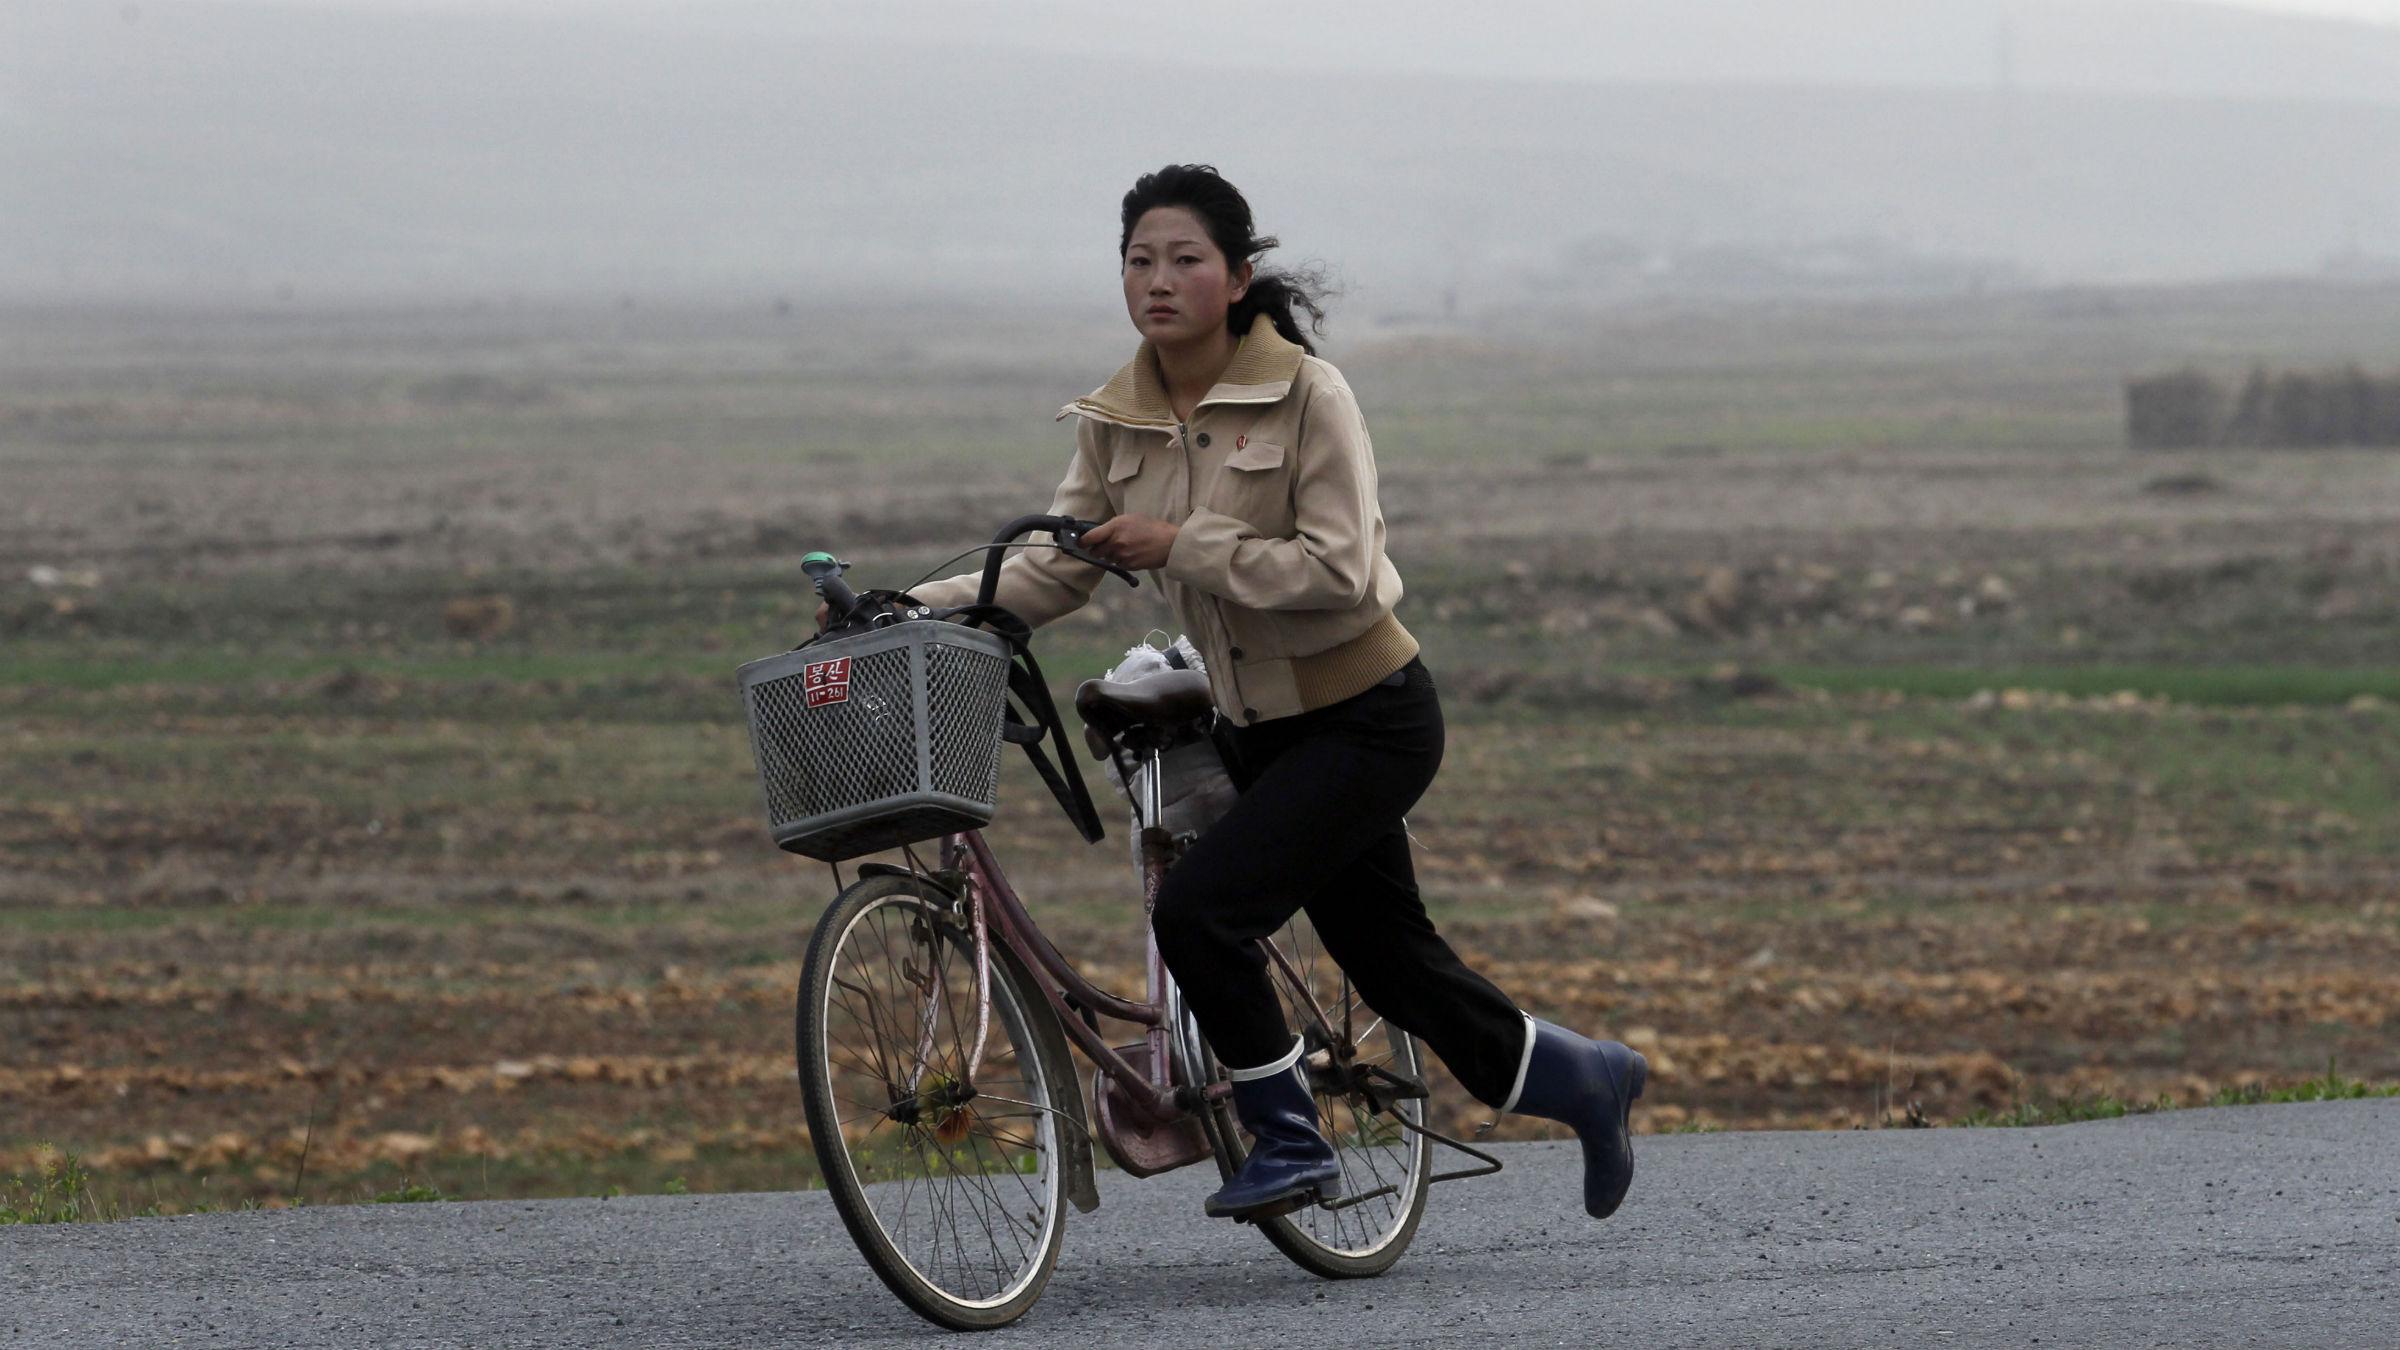 Woman on bike in North Korea